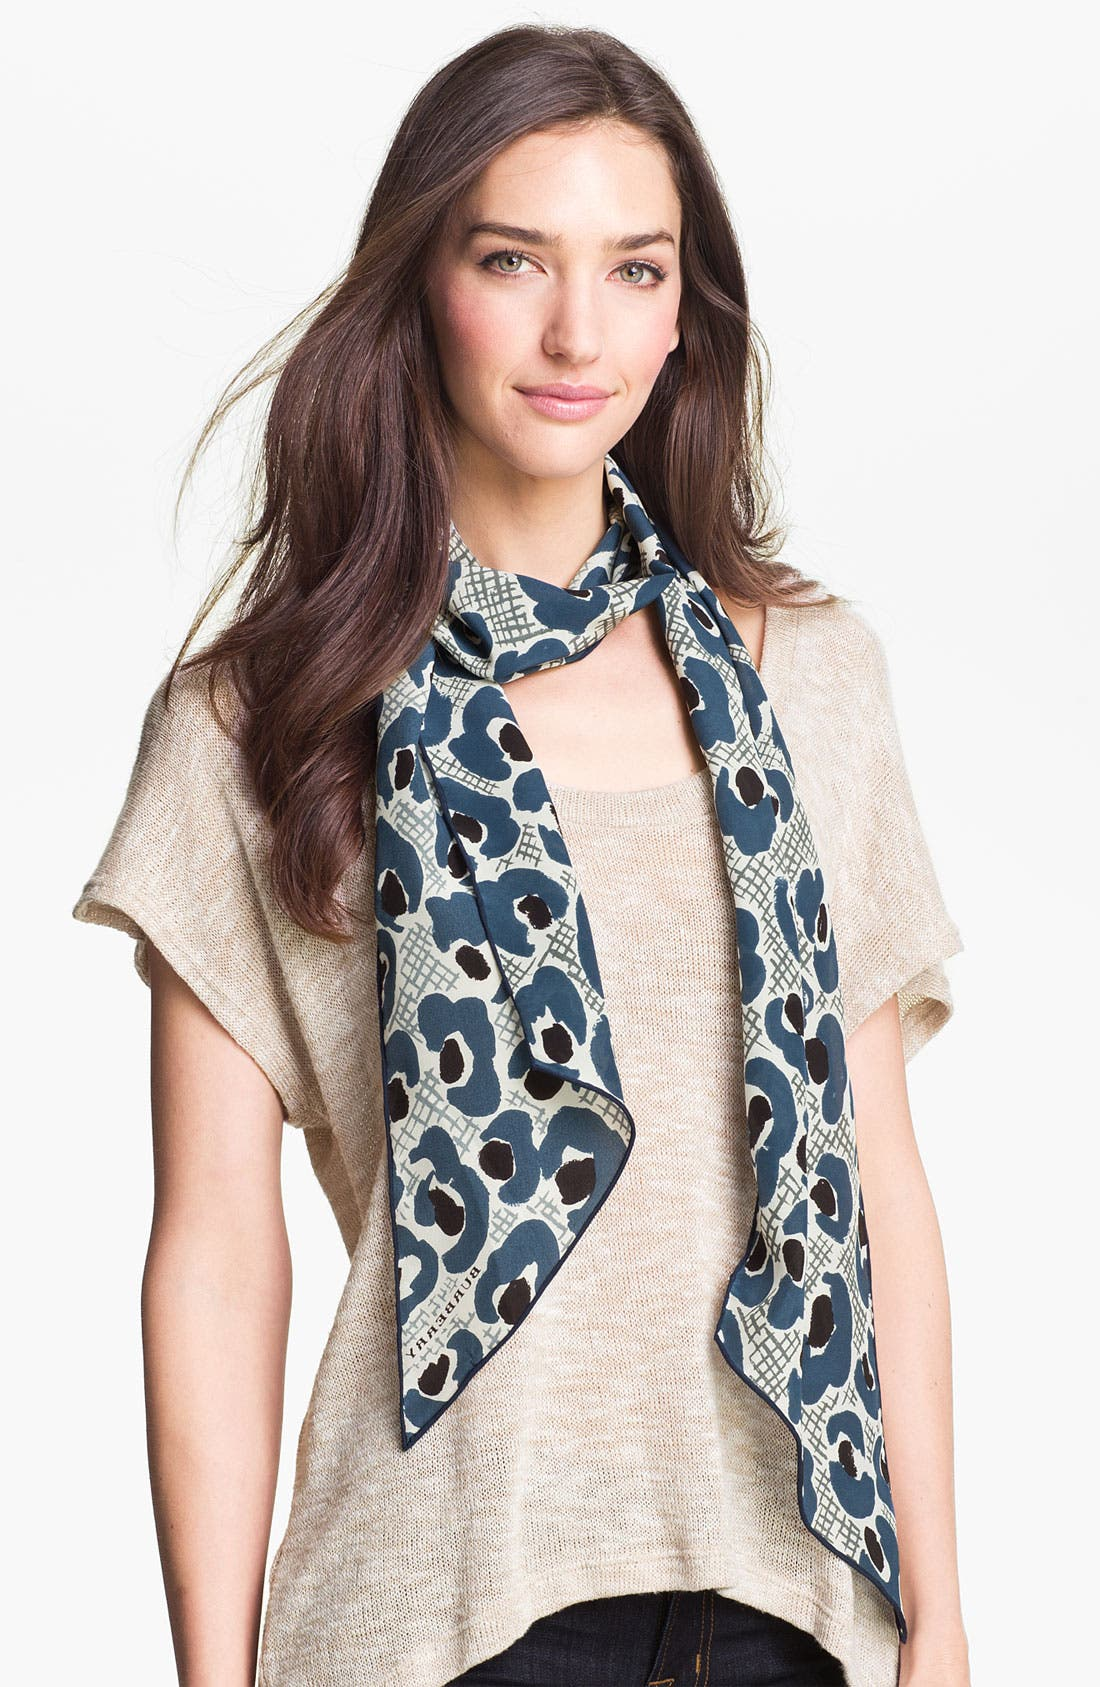 Main Image - Burberry Prorsum 'Animal Floral' Silk Scarf